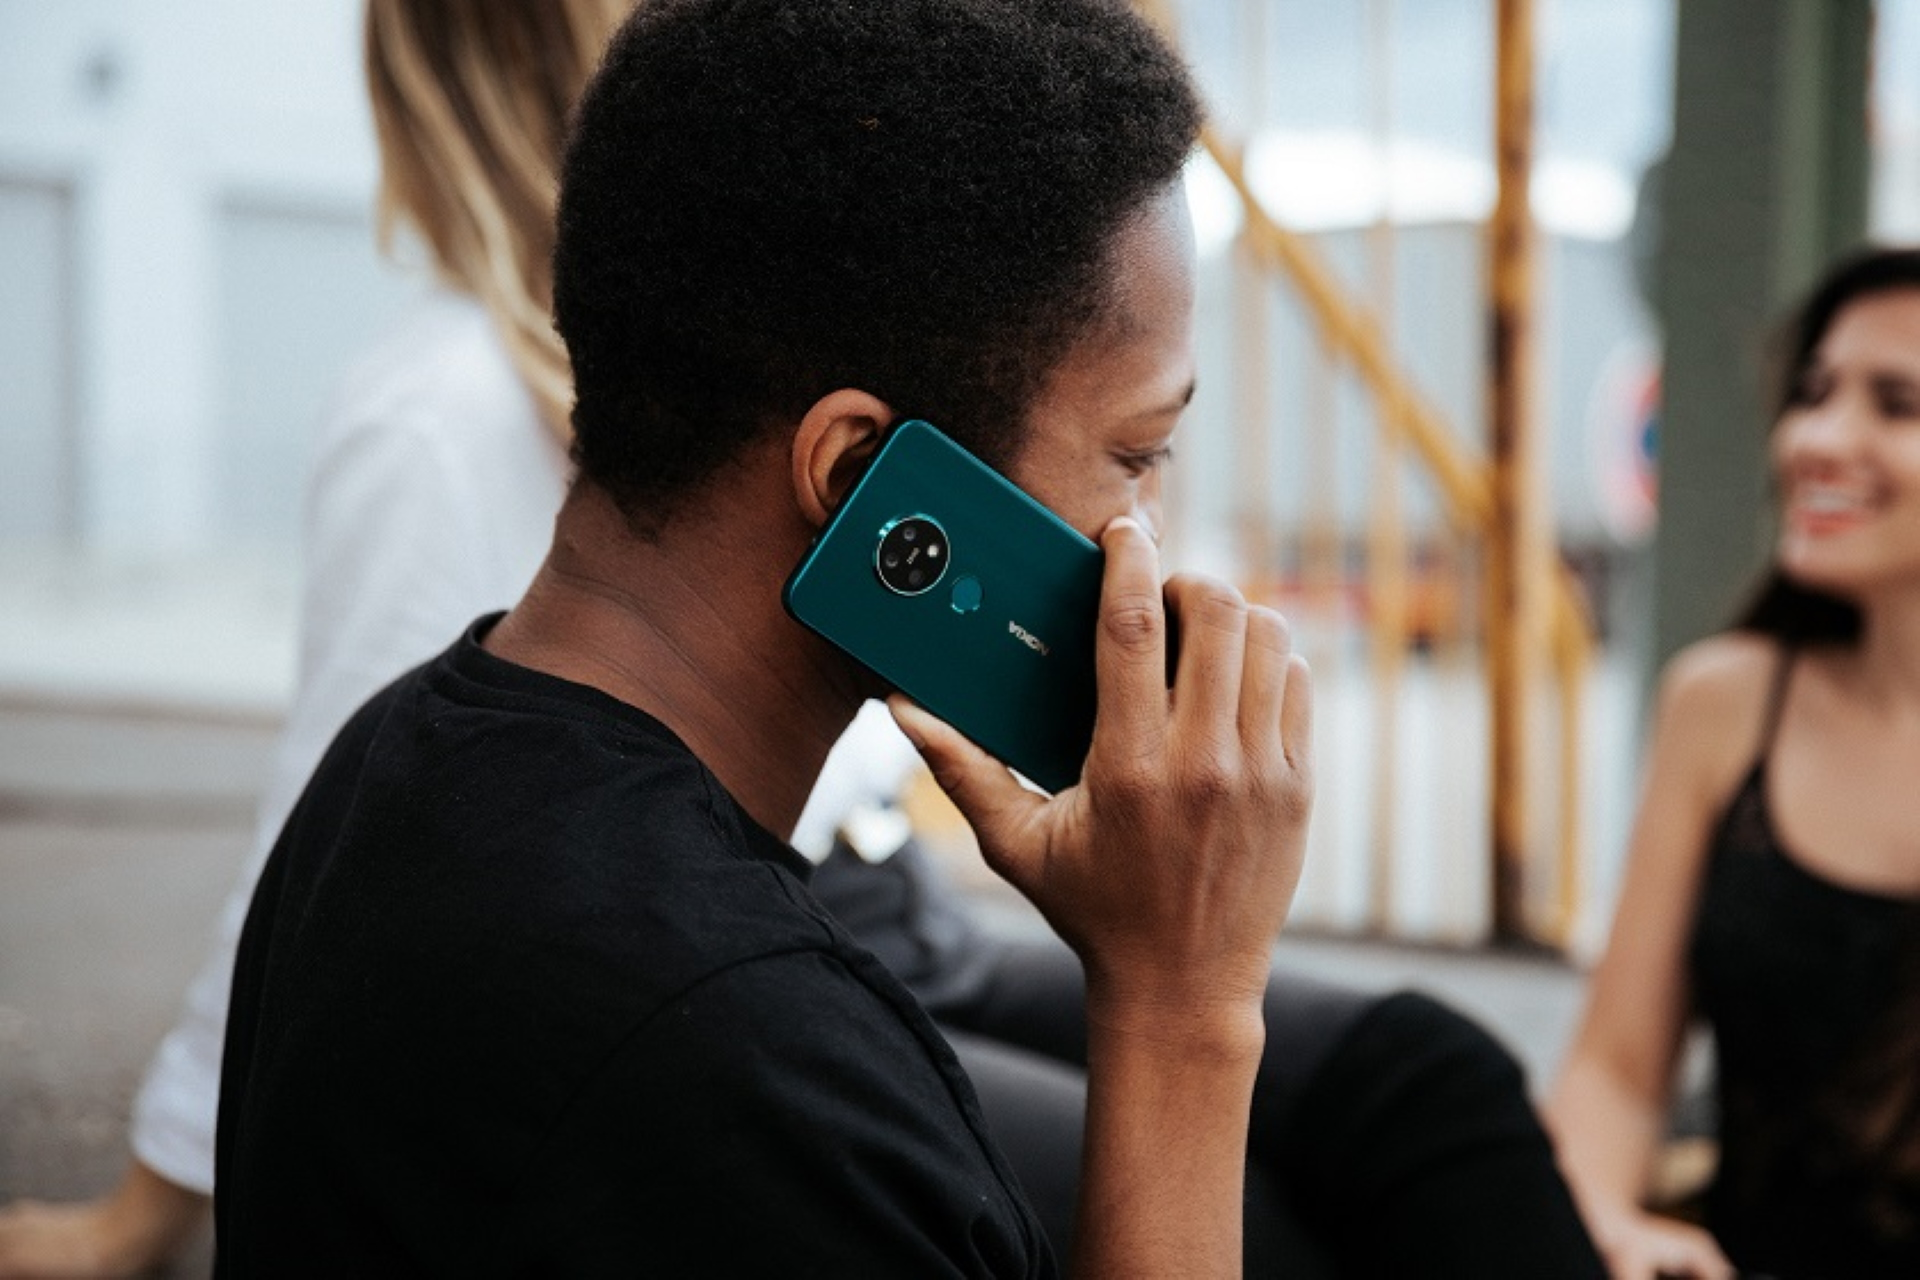 Nokia conferma Android 10 per diversi suoi smartphone, fra c